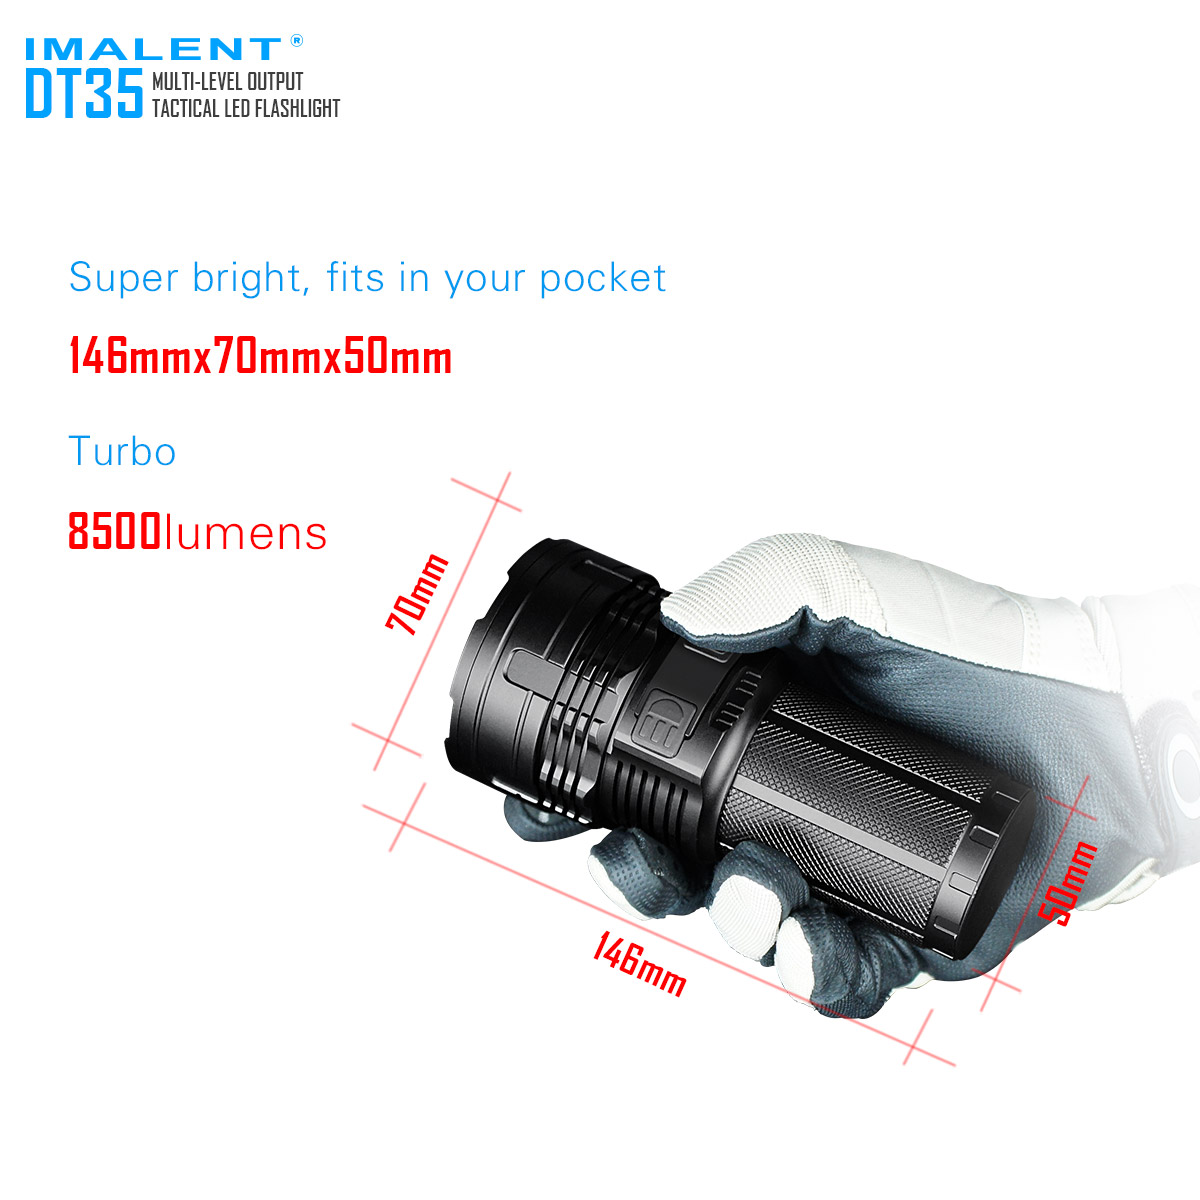 IMALENT DT35